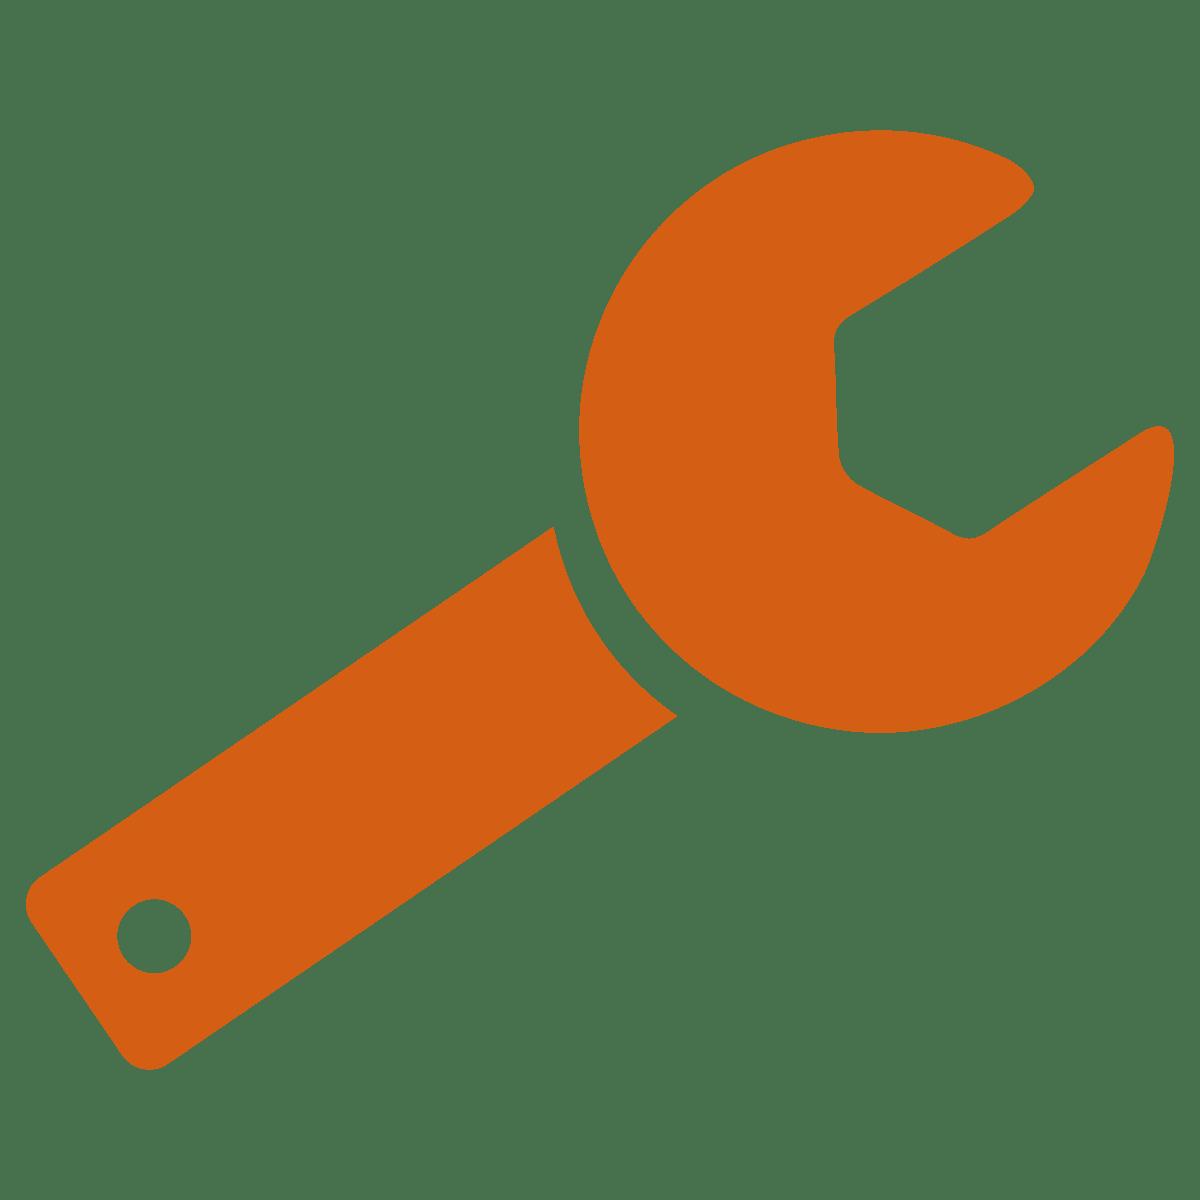 arvense-group-5f-methodology-step-2-form-orange